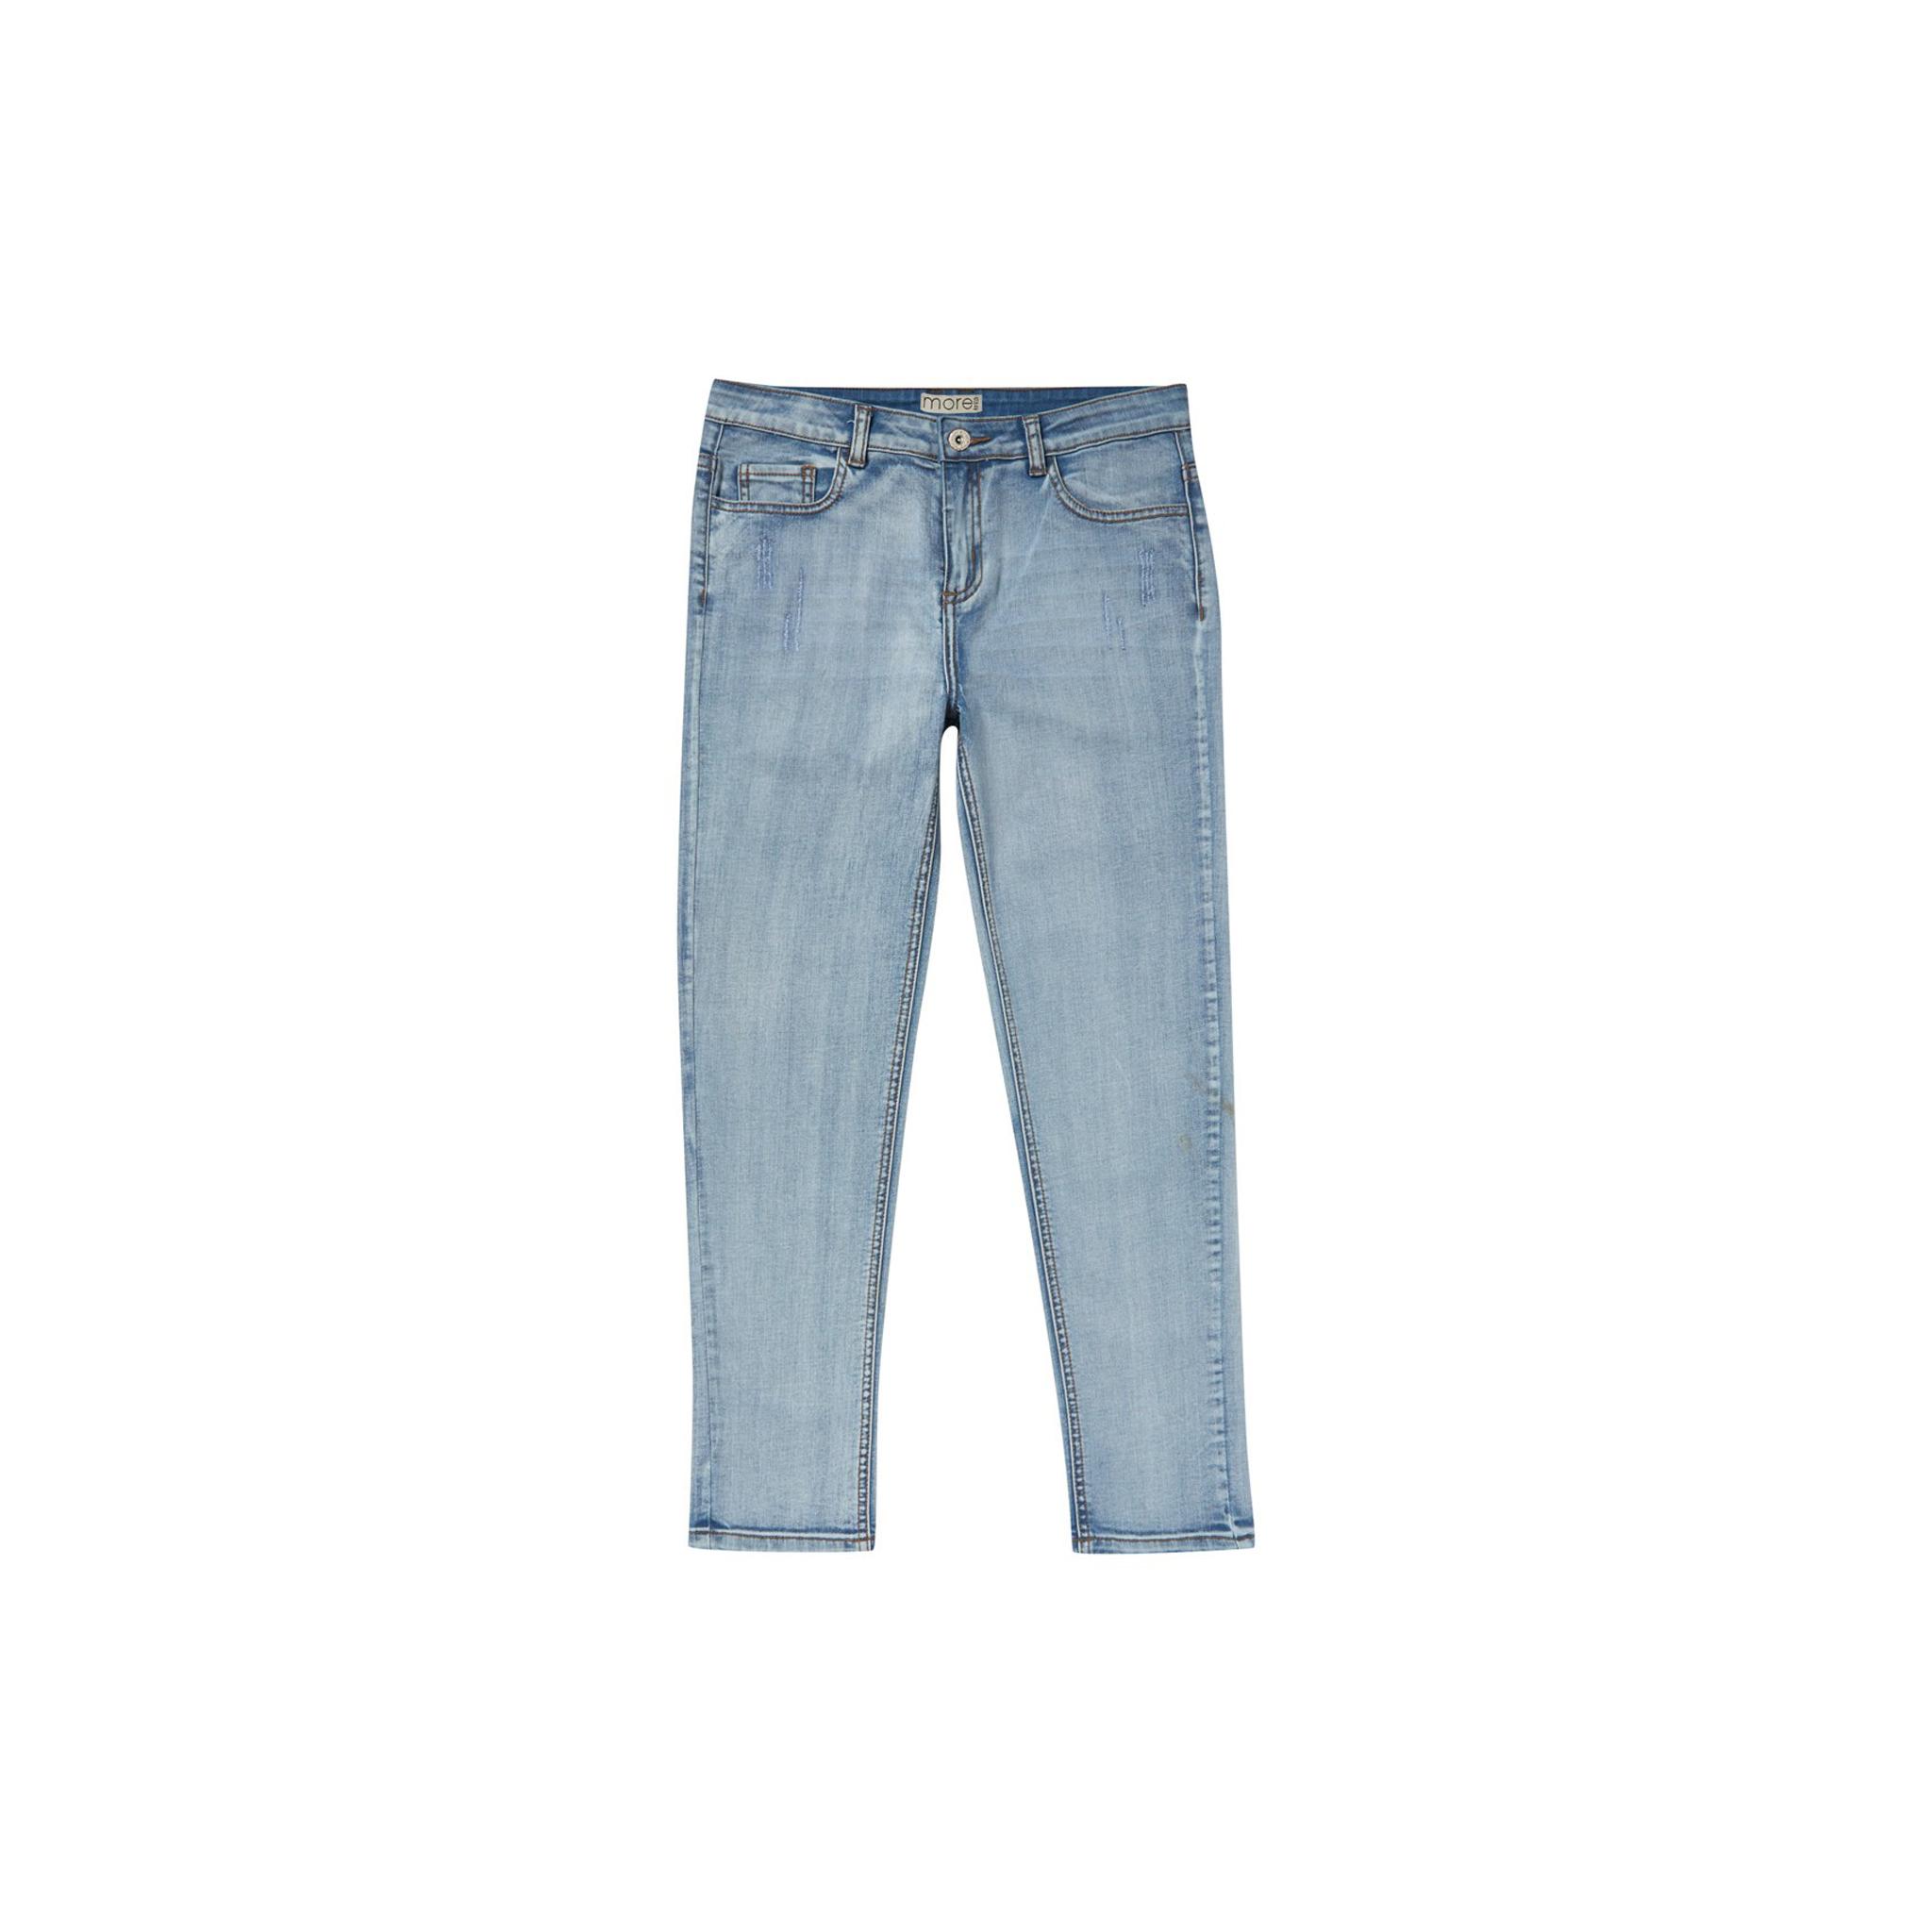 boys-light-wash-jeans_fr-400x526-2